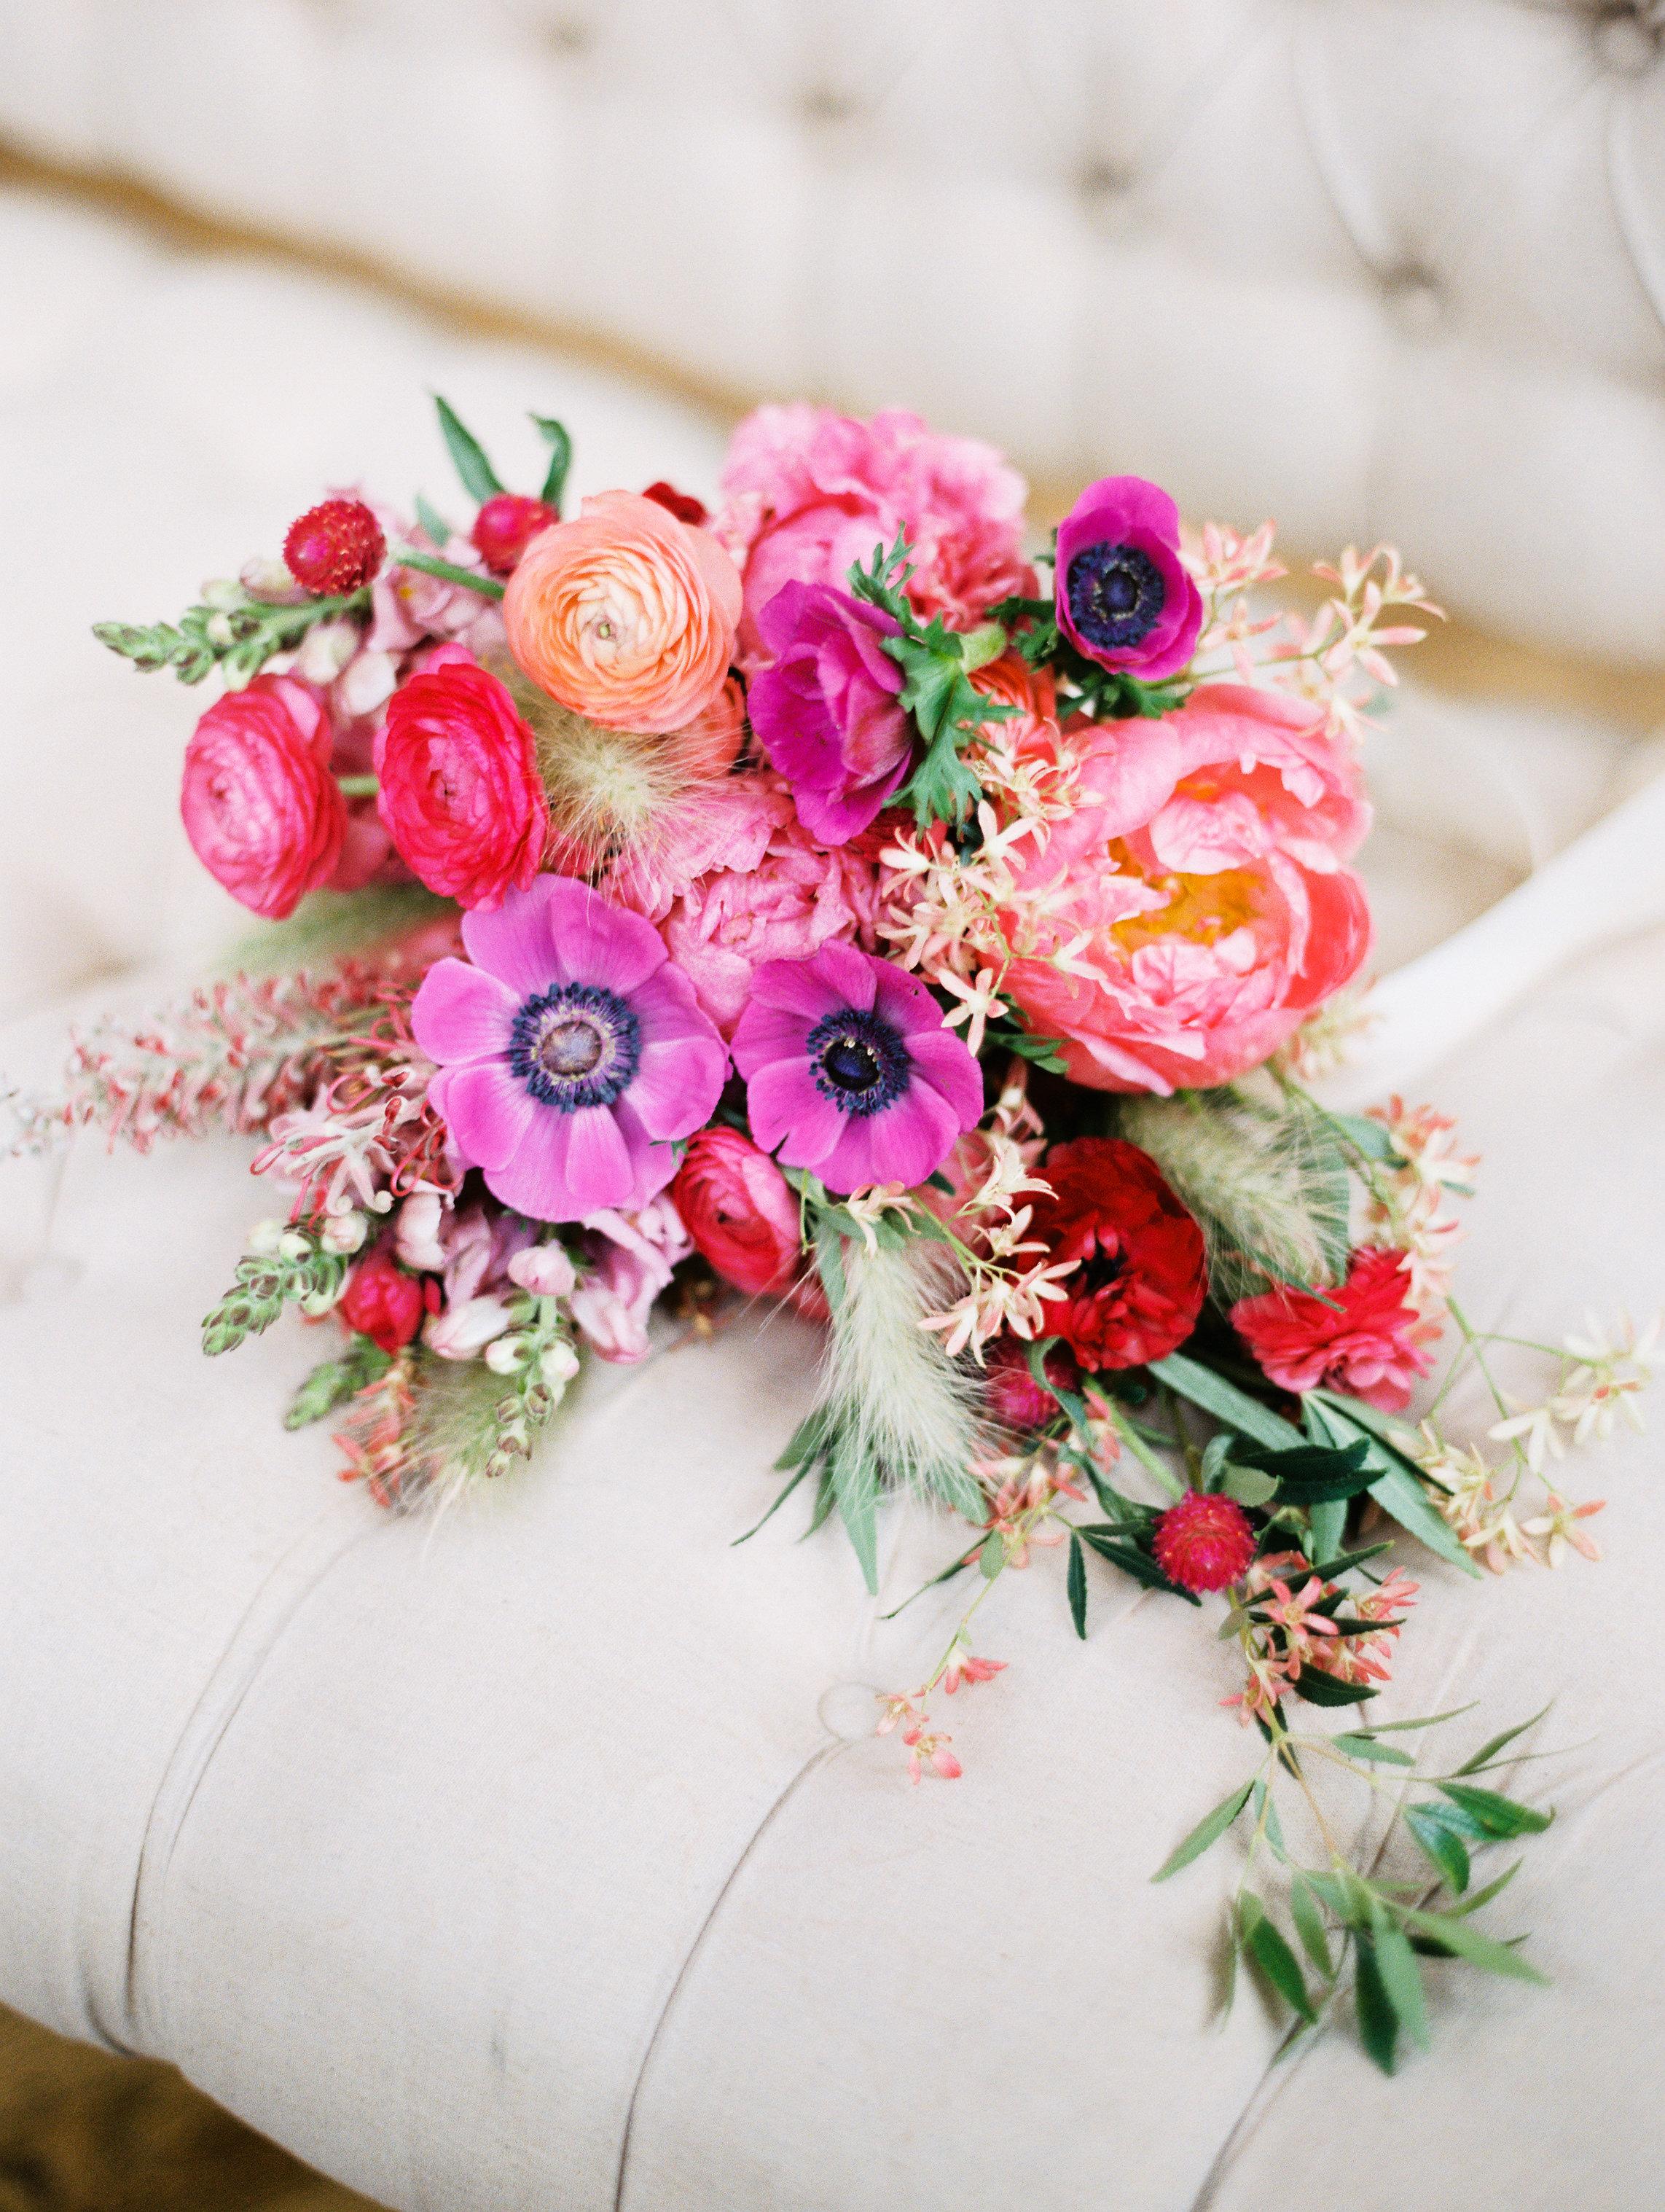 Fleur-Inc-Bridal-Bouquet-Coral-Charm-Peony-Bloom-Bash-Ashley-Slater-Photography